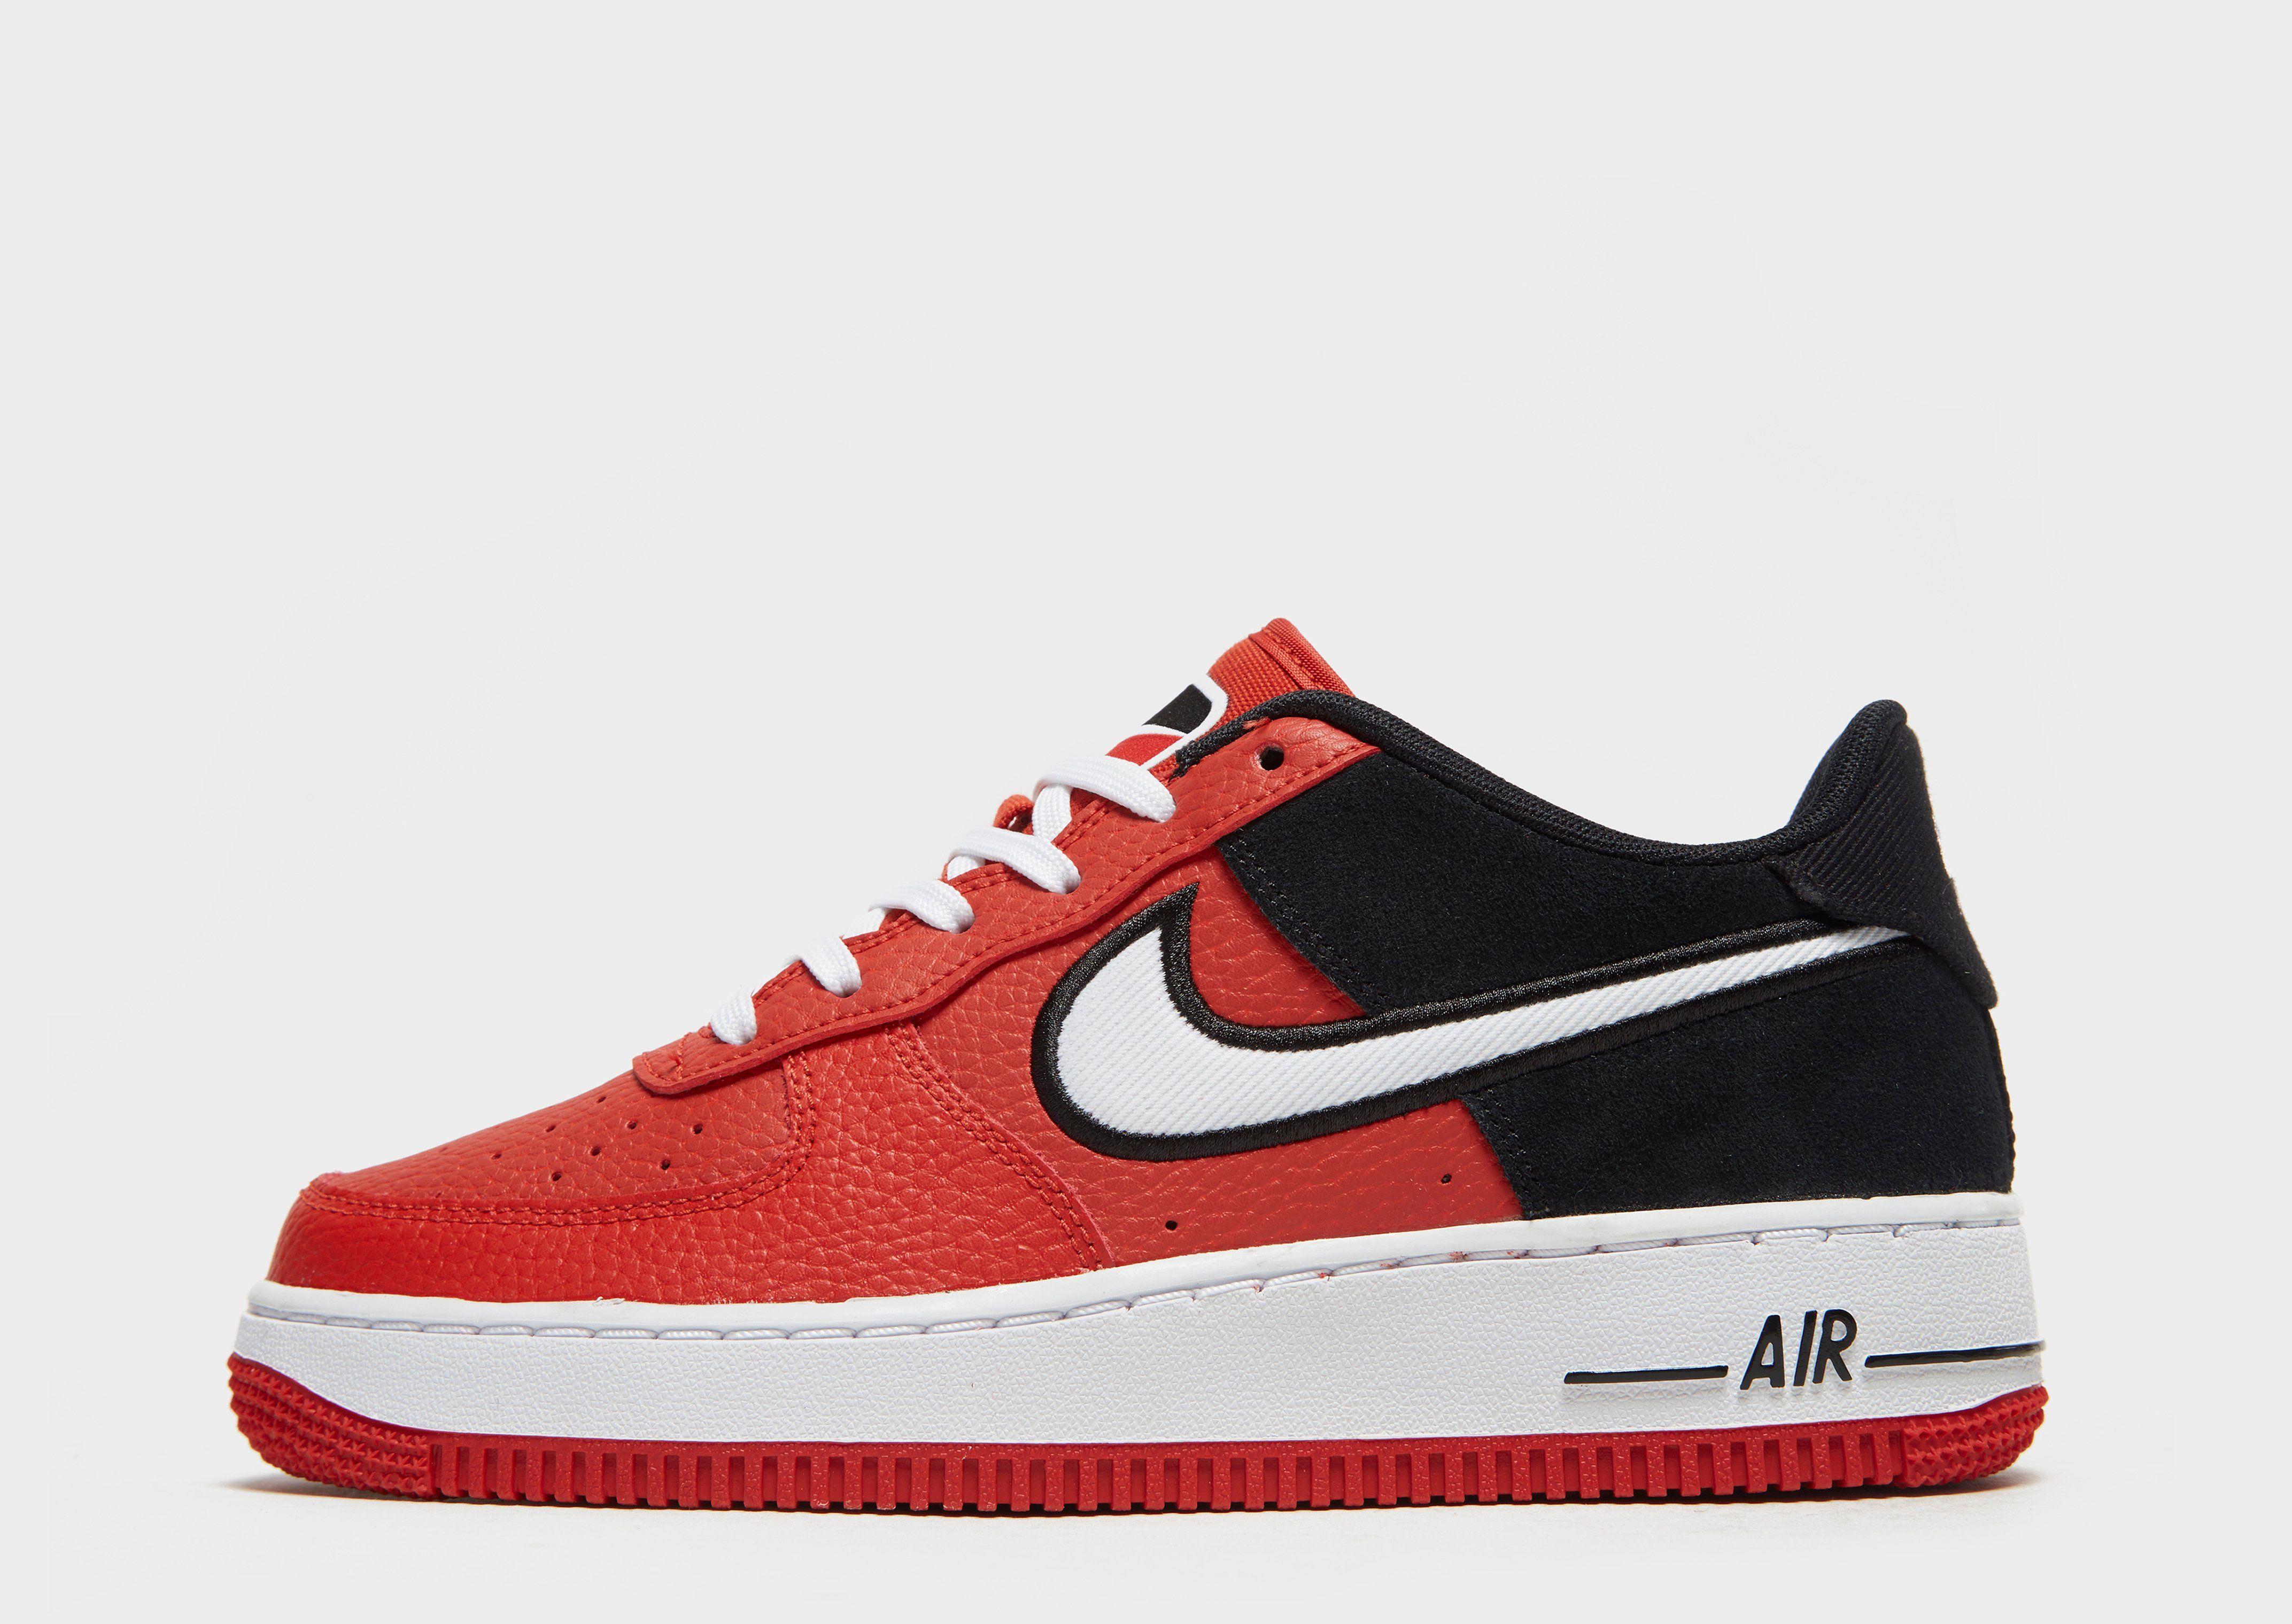 new product 75ed0 c598b Nike Air Force 1 Low Junior | JD Sports Ireland